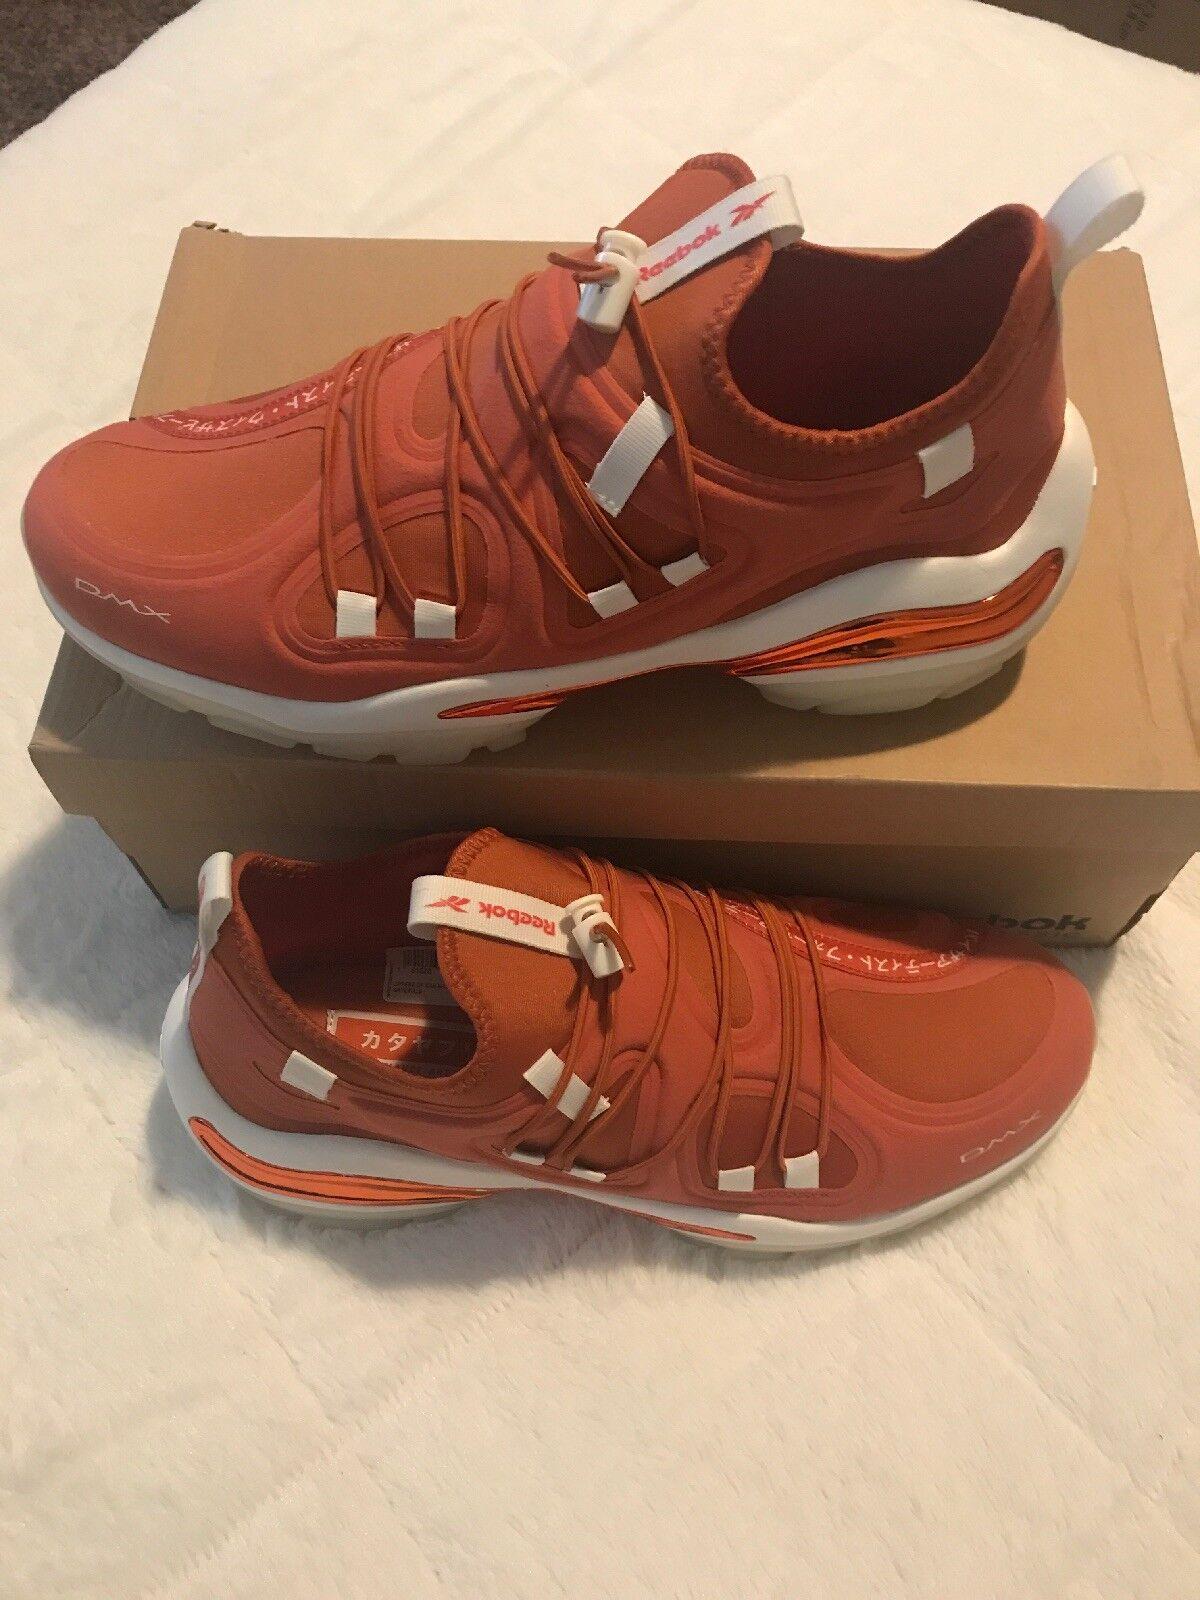 Reebok Dmx Series 2000 Low Mens orange Textile Athletic Training shoes 10